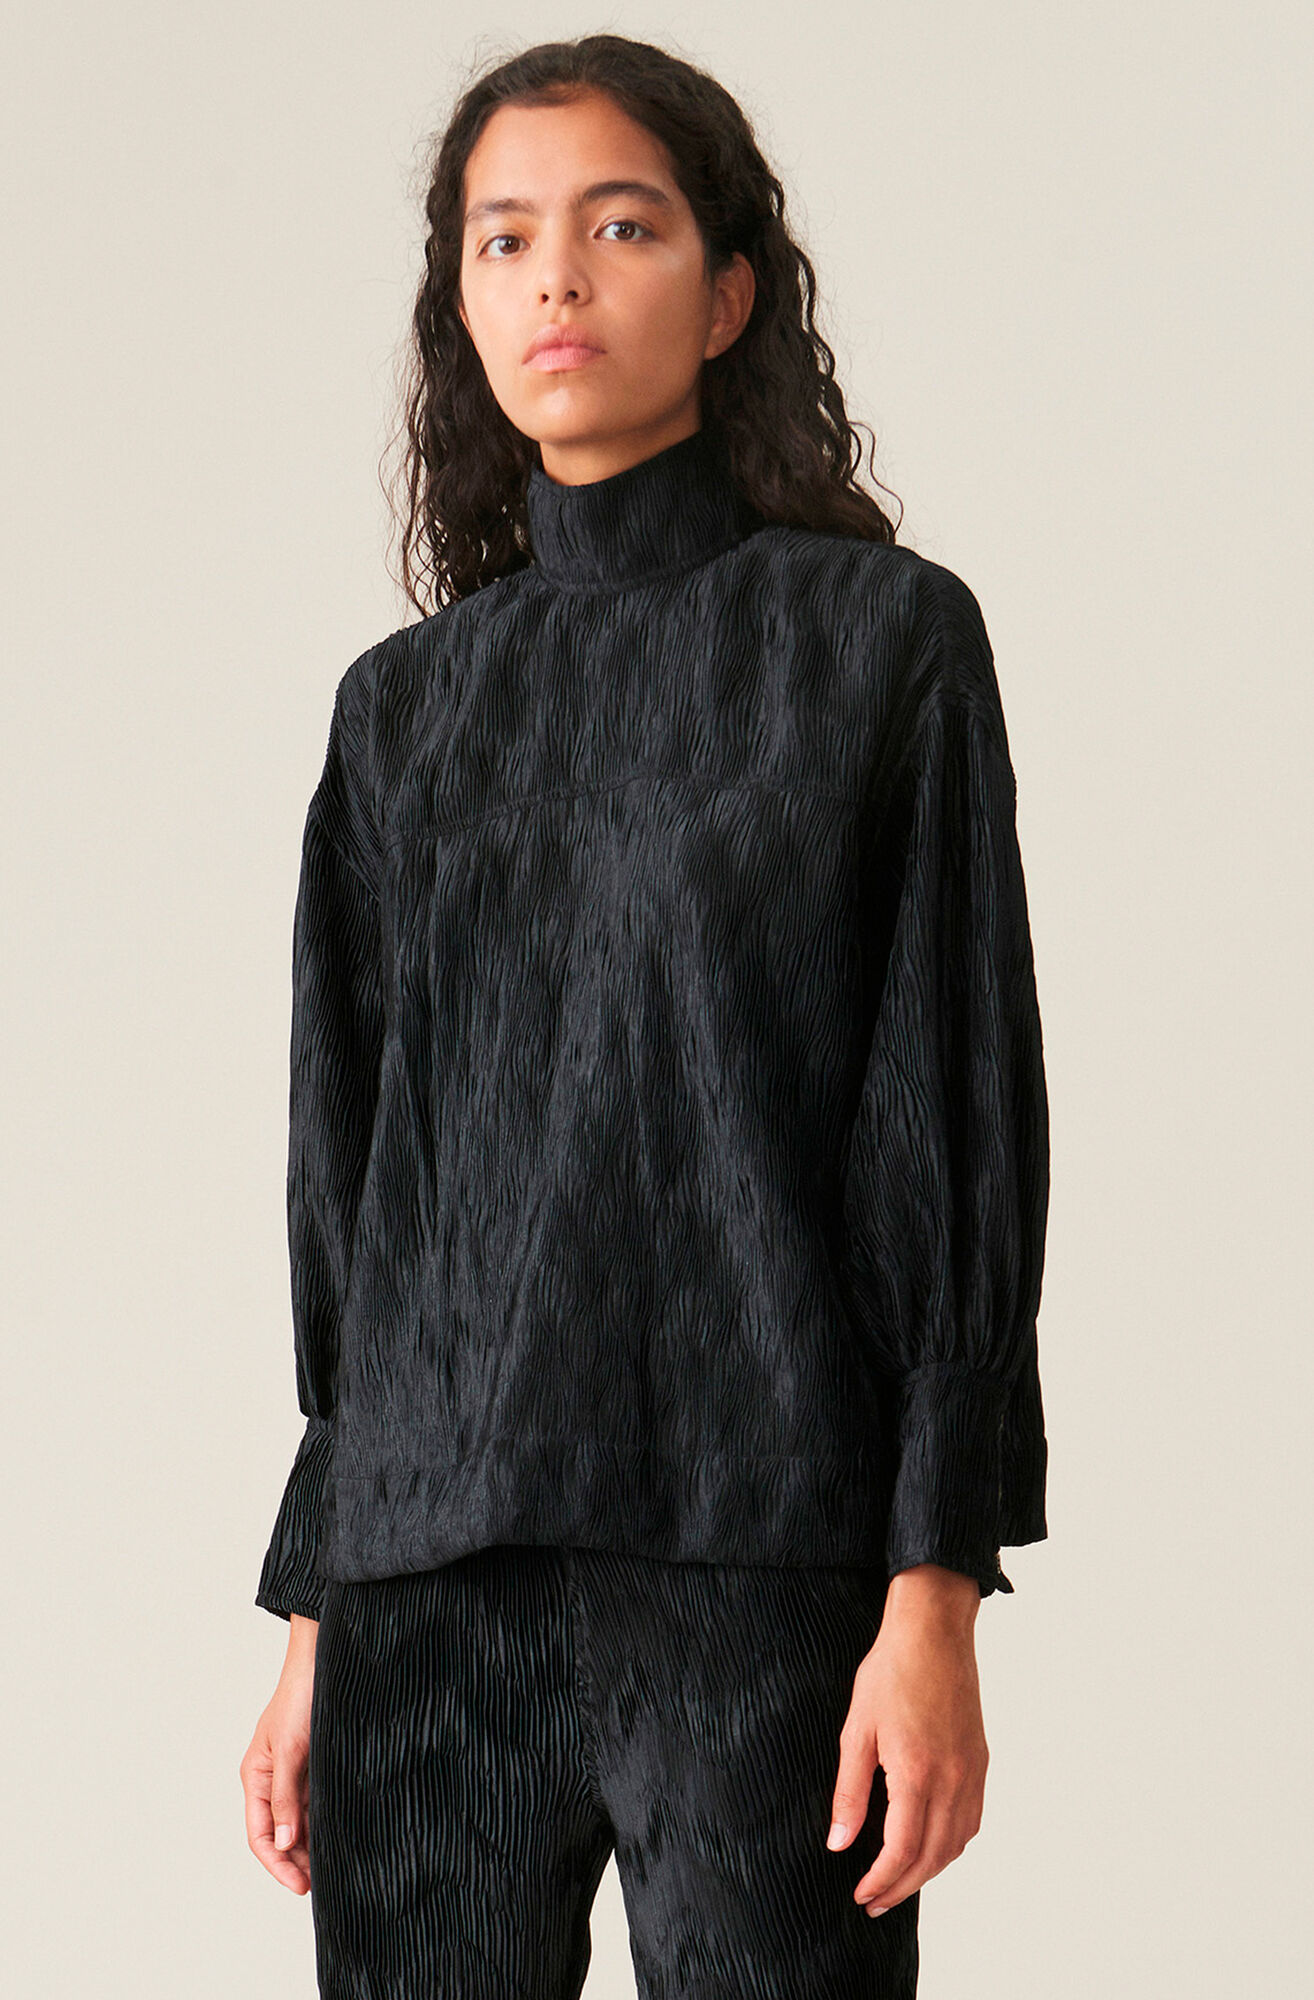 blouse black pleating